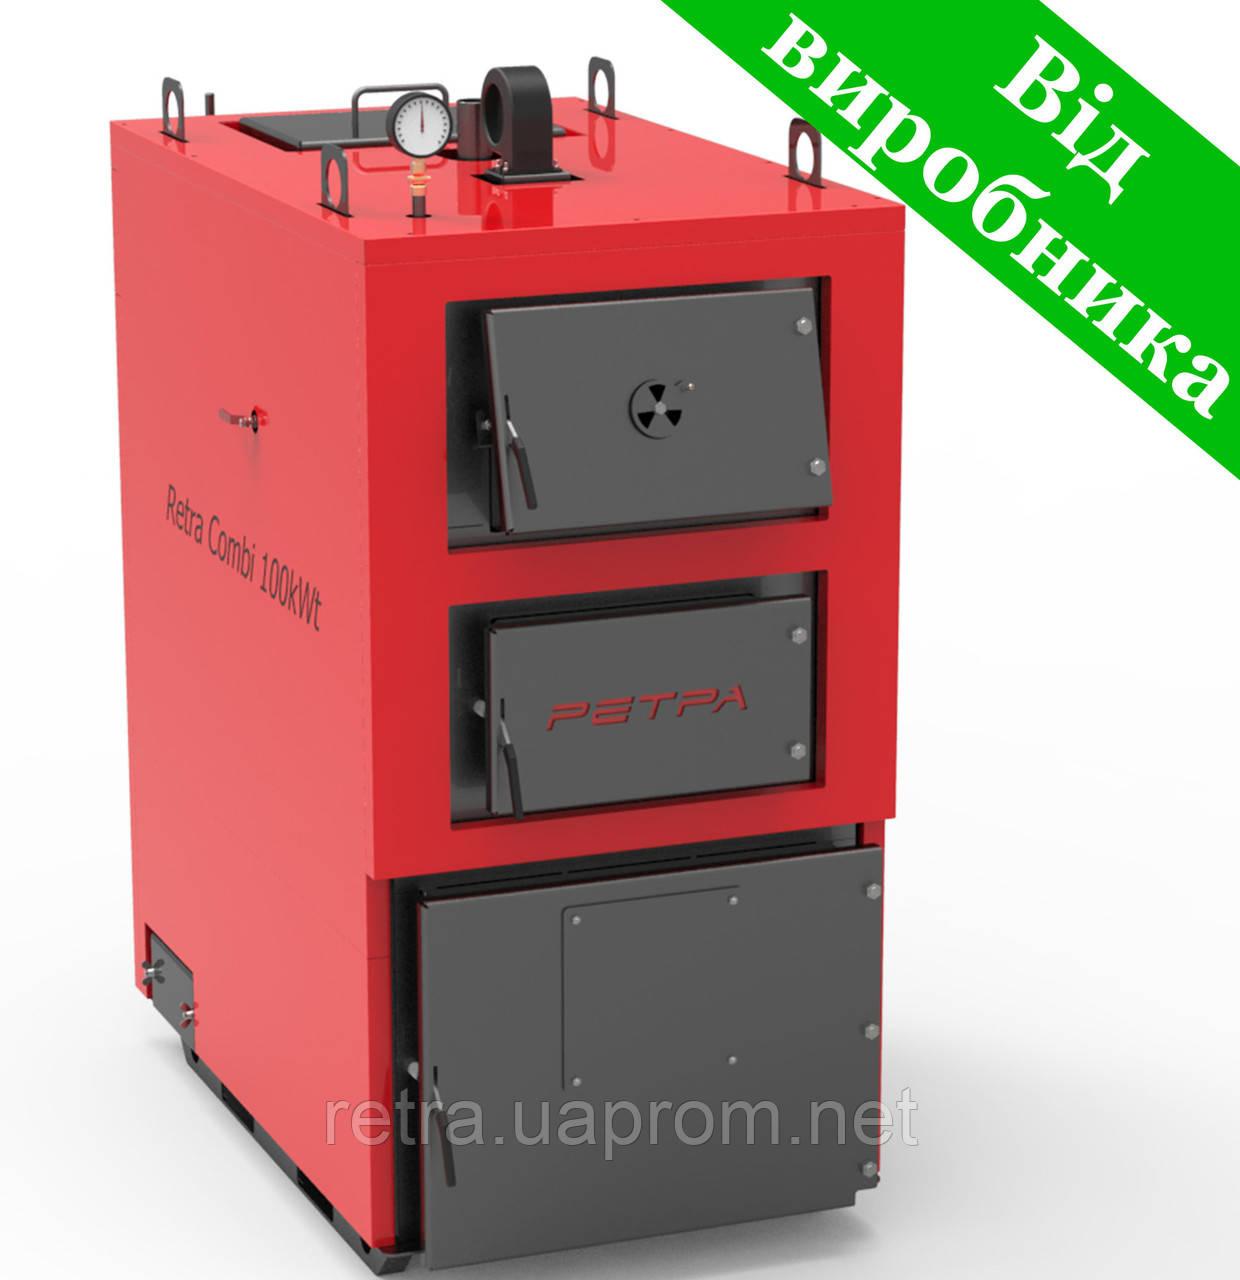 Котел твердотопливный Ретра-4М Combi 40 кВт